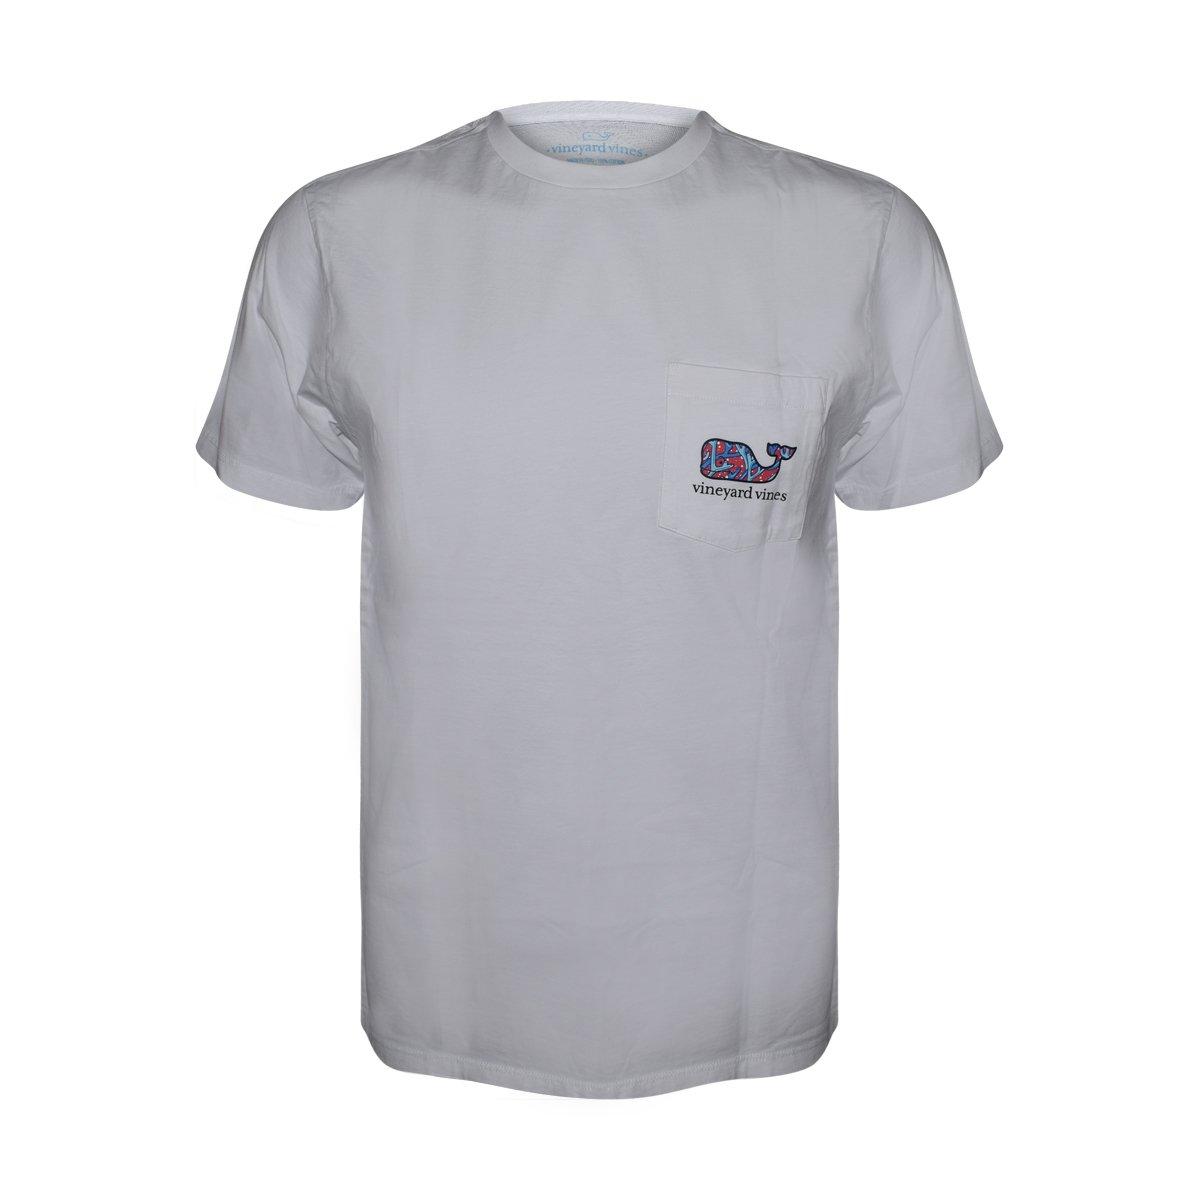 Vineyard Vinesメンズ半袖City Whale Teeシャツ B0796WSKST XL|White Cap/Bonefish White Cap/Bonefish XL